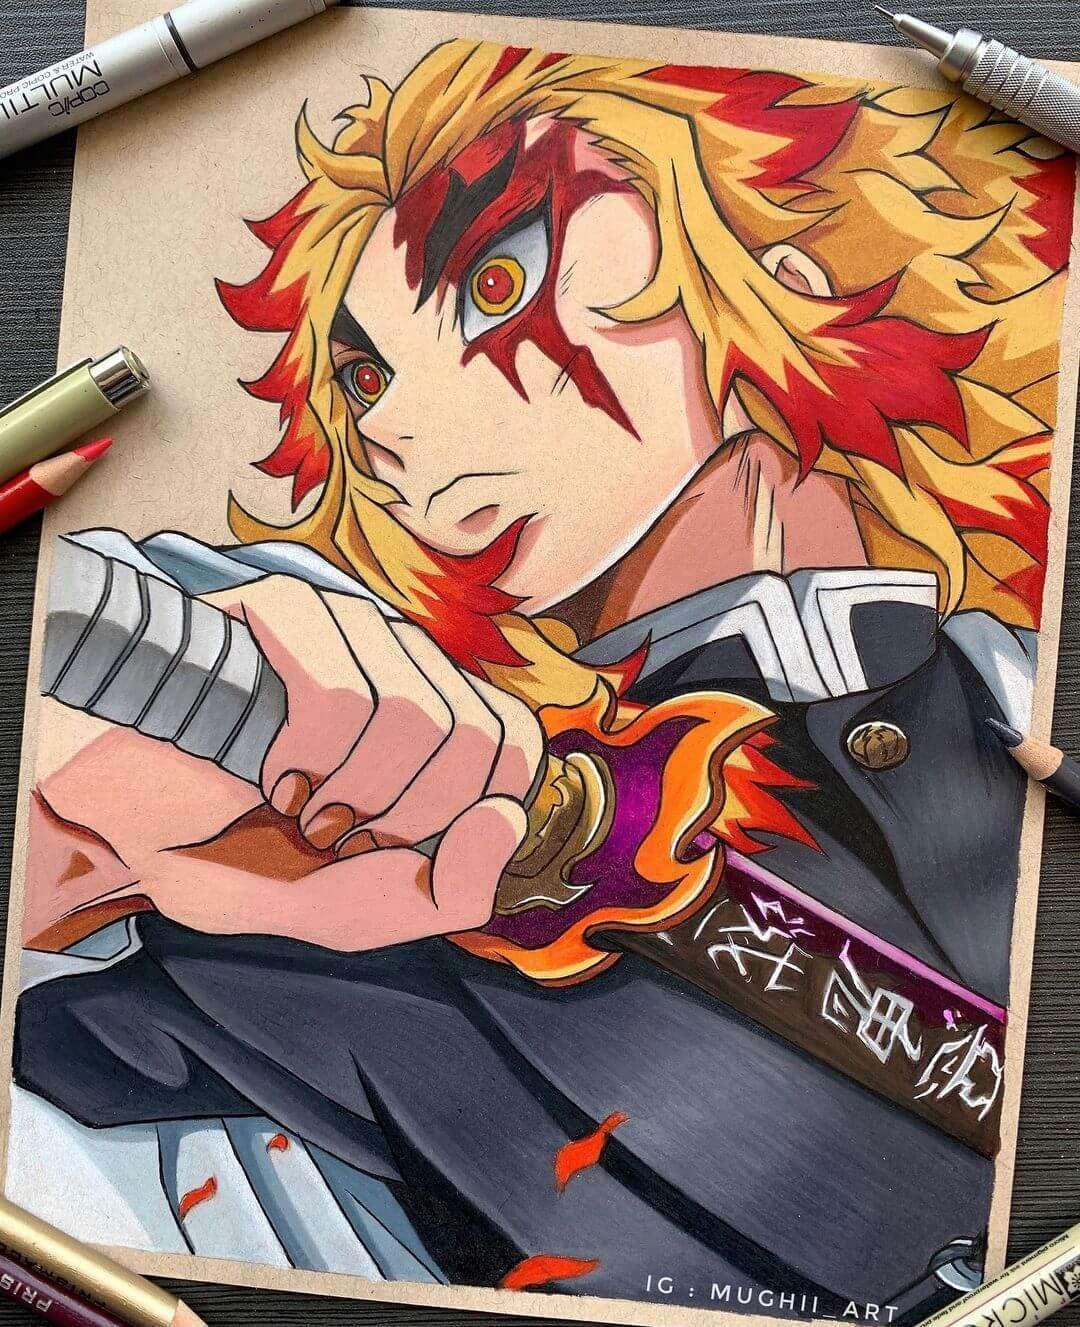 Rengoku from Demon slayer by mughii_art - Manga Art